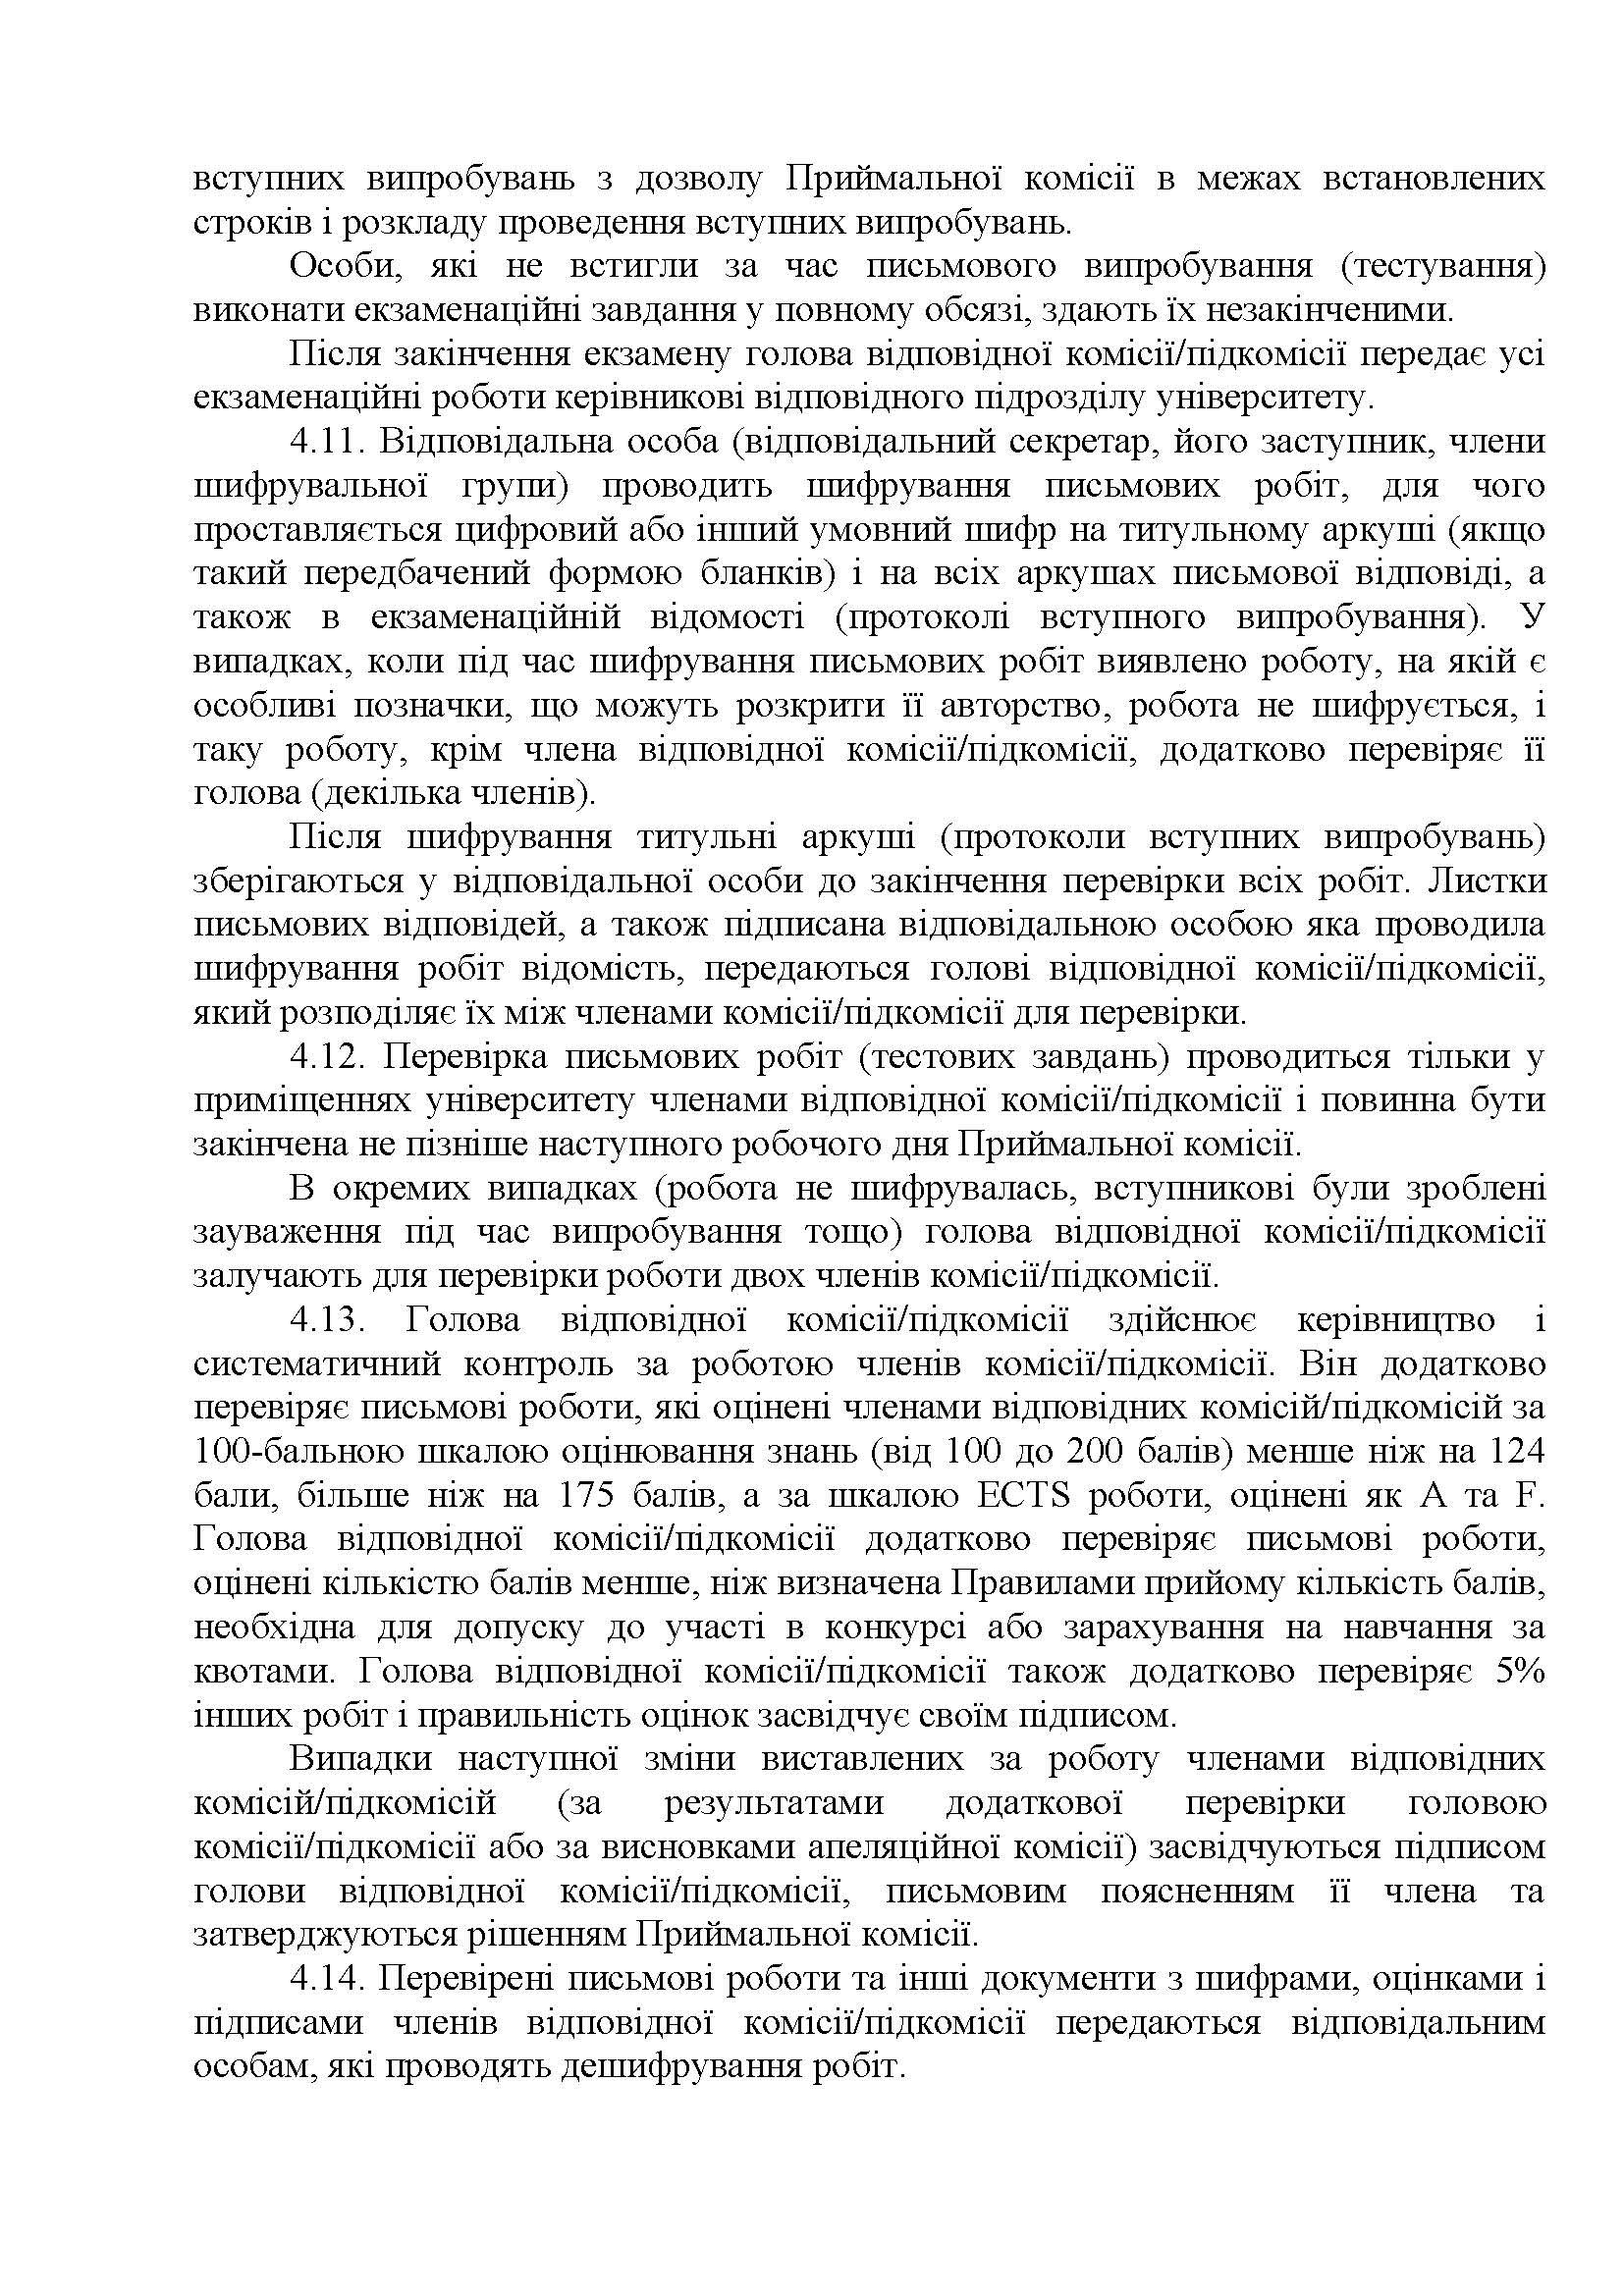 ПОЛОЖЕННЯ про Приймальну комисию 2017_Страница_08